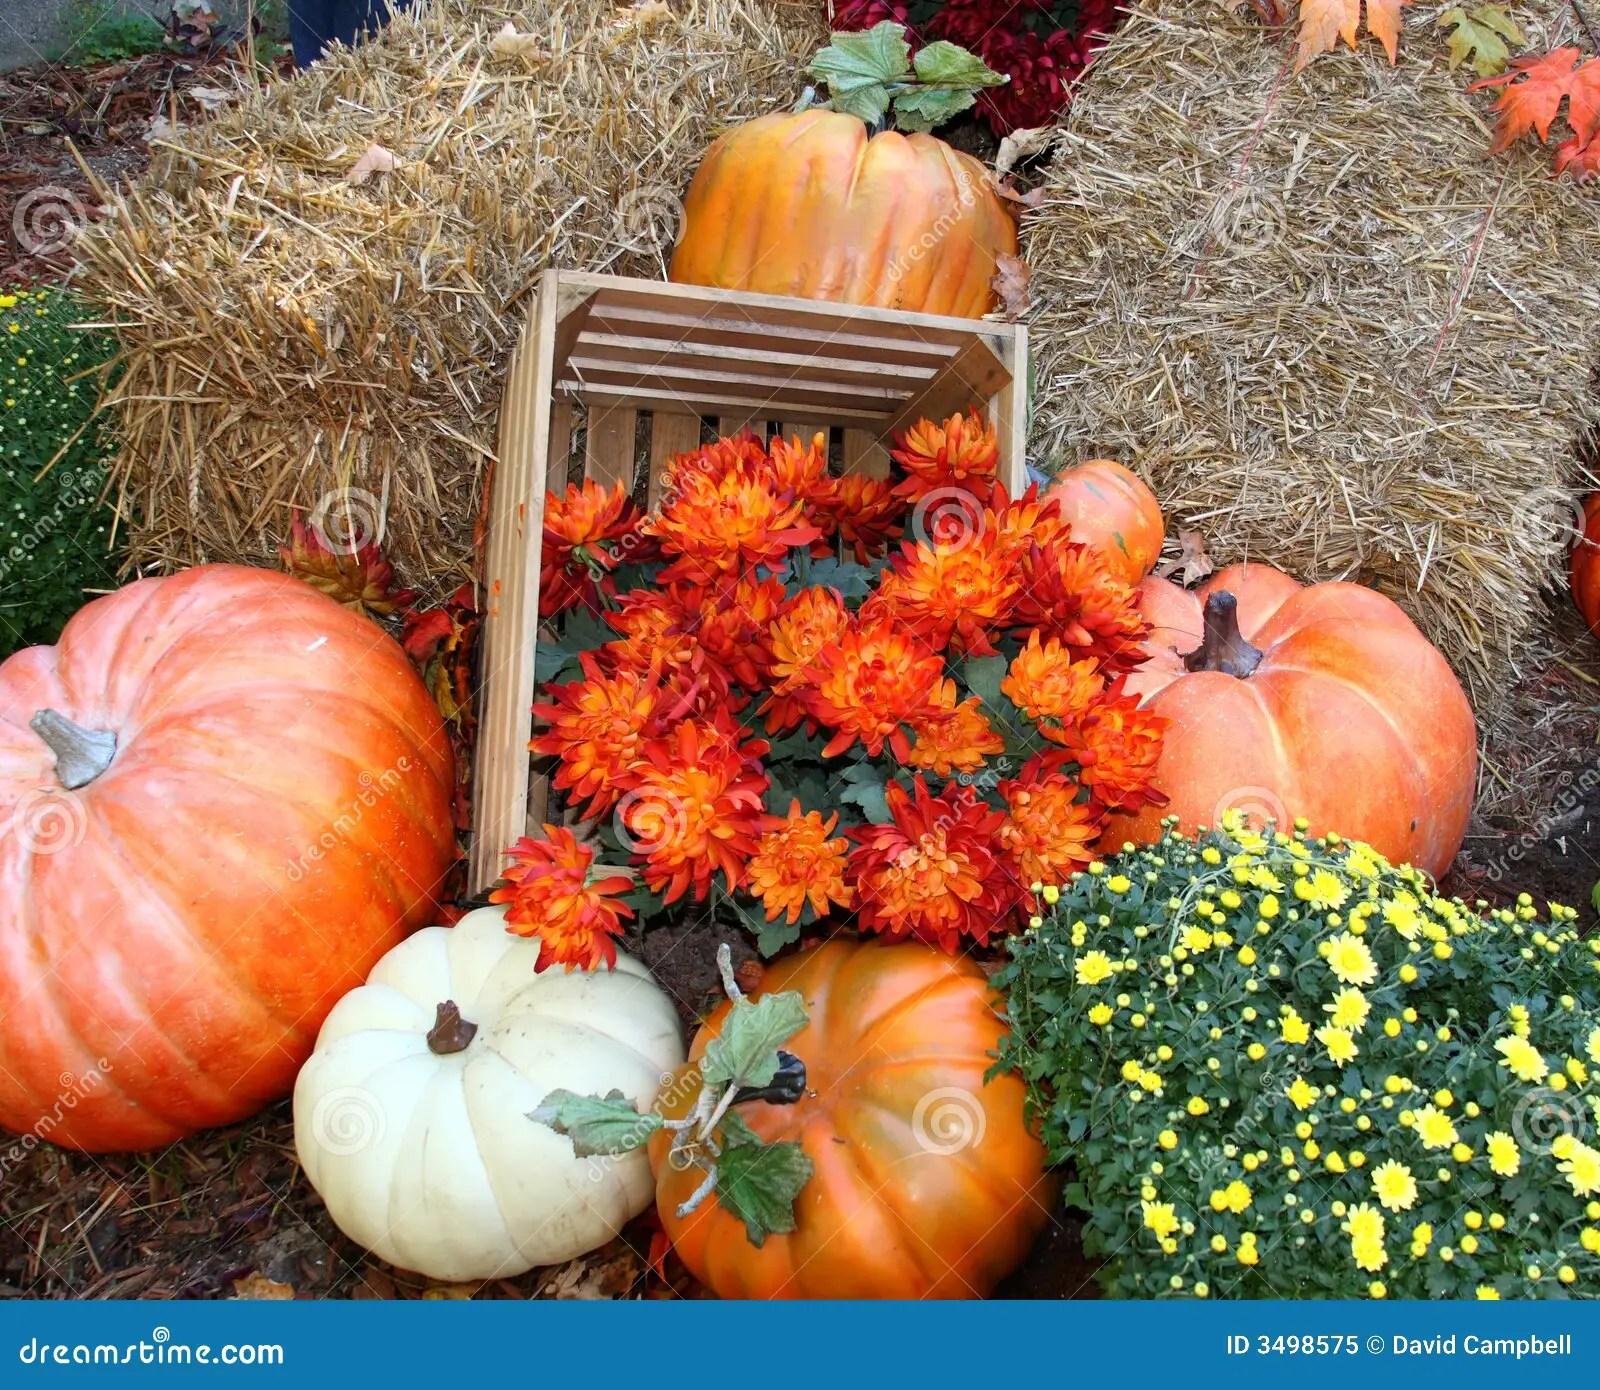 Fall Scenes Wallpaper With Pumpkins Fall Pumpkin Arrangement Royalty Free Stock Photo Image